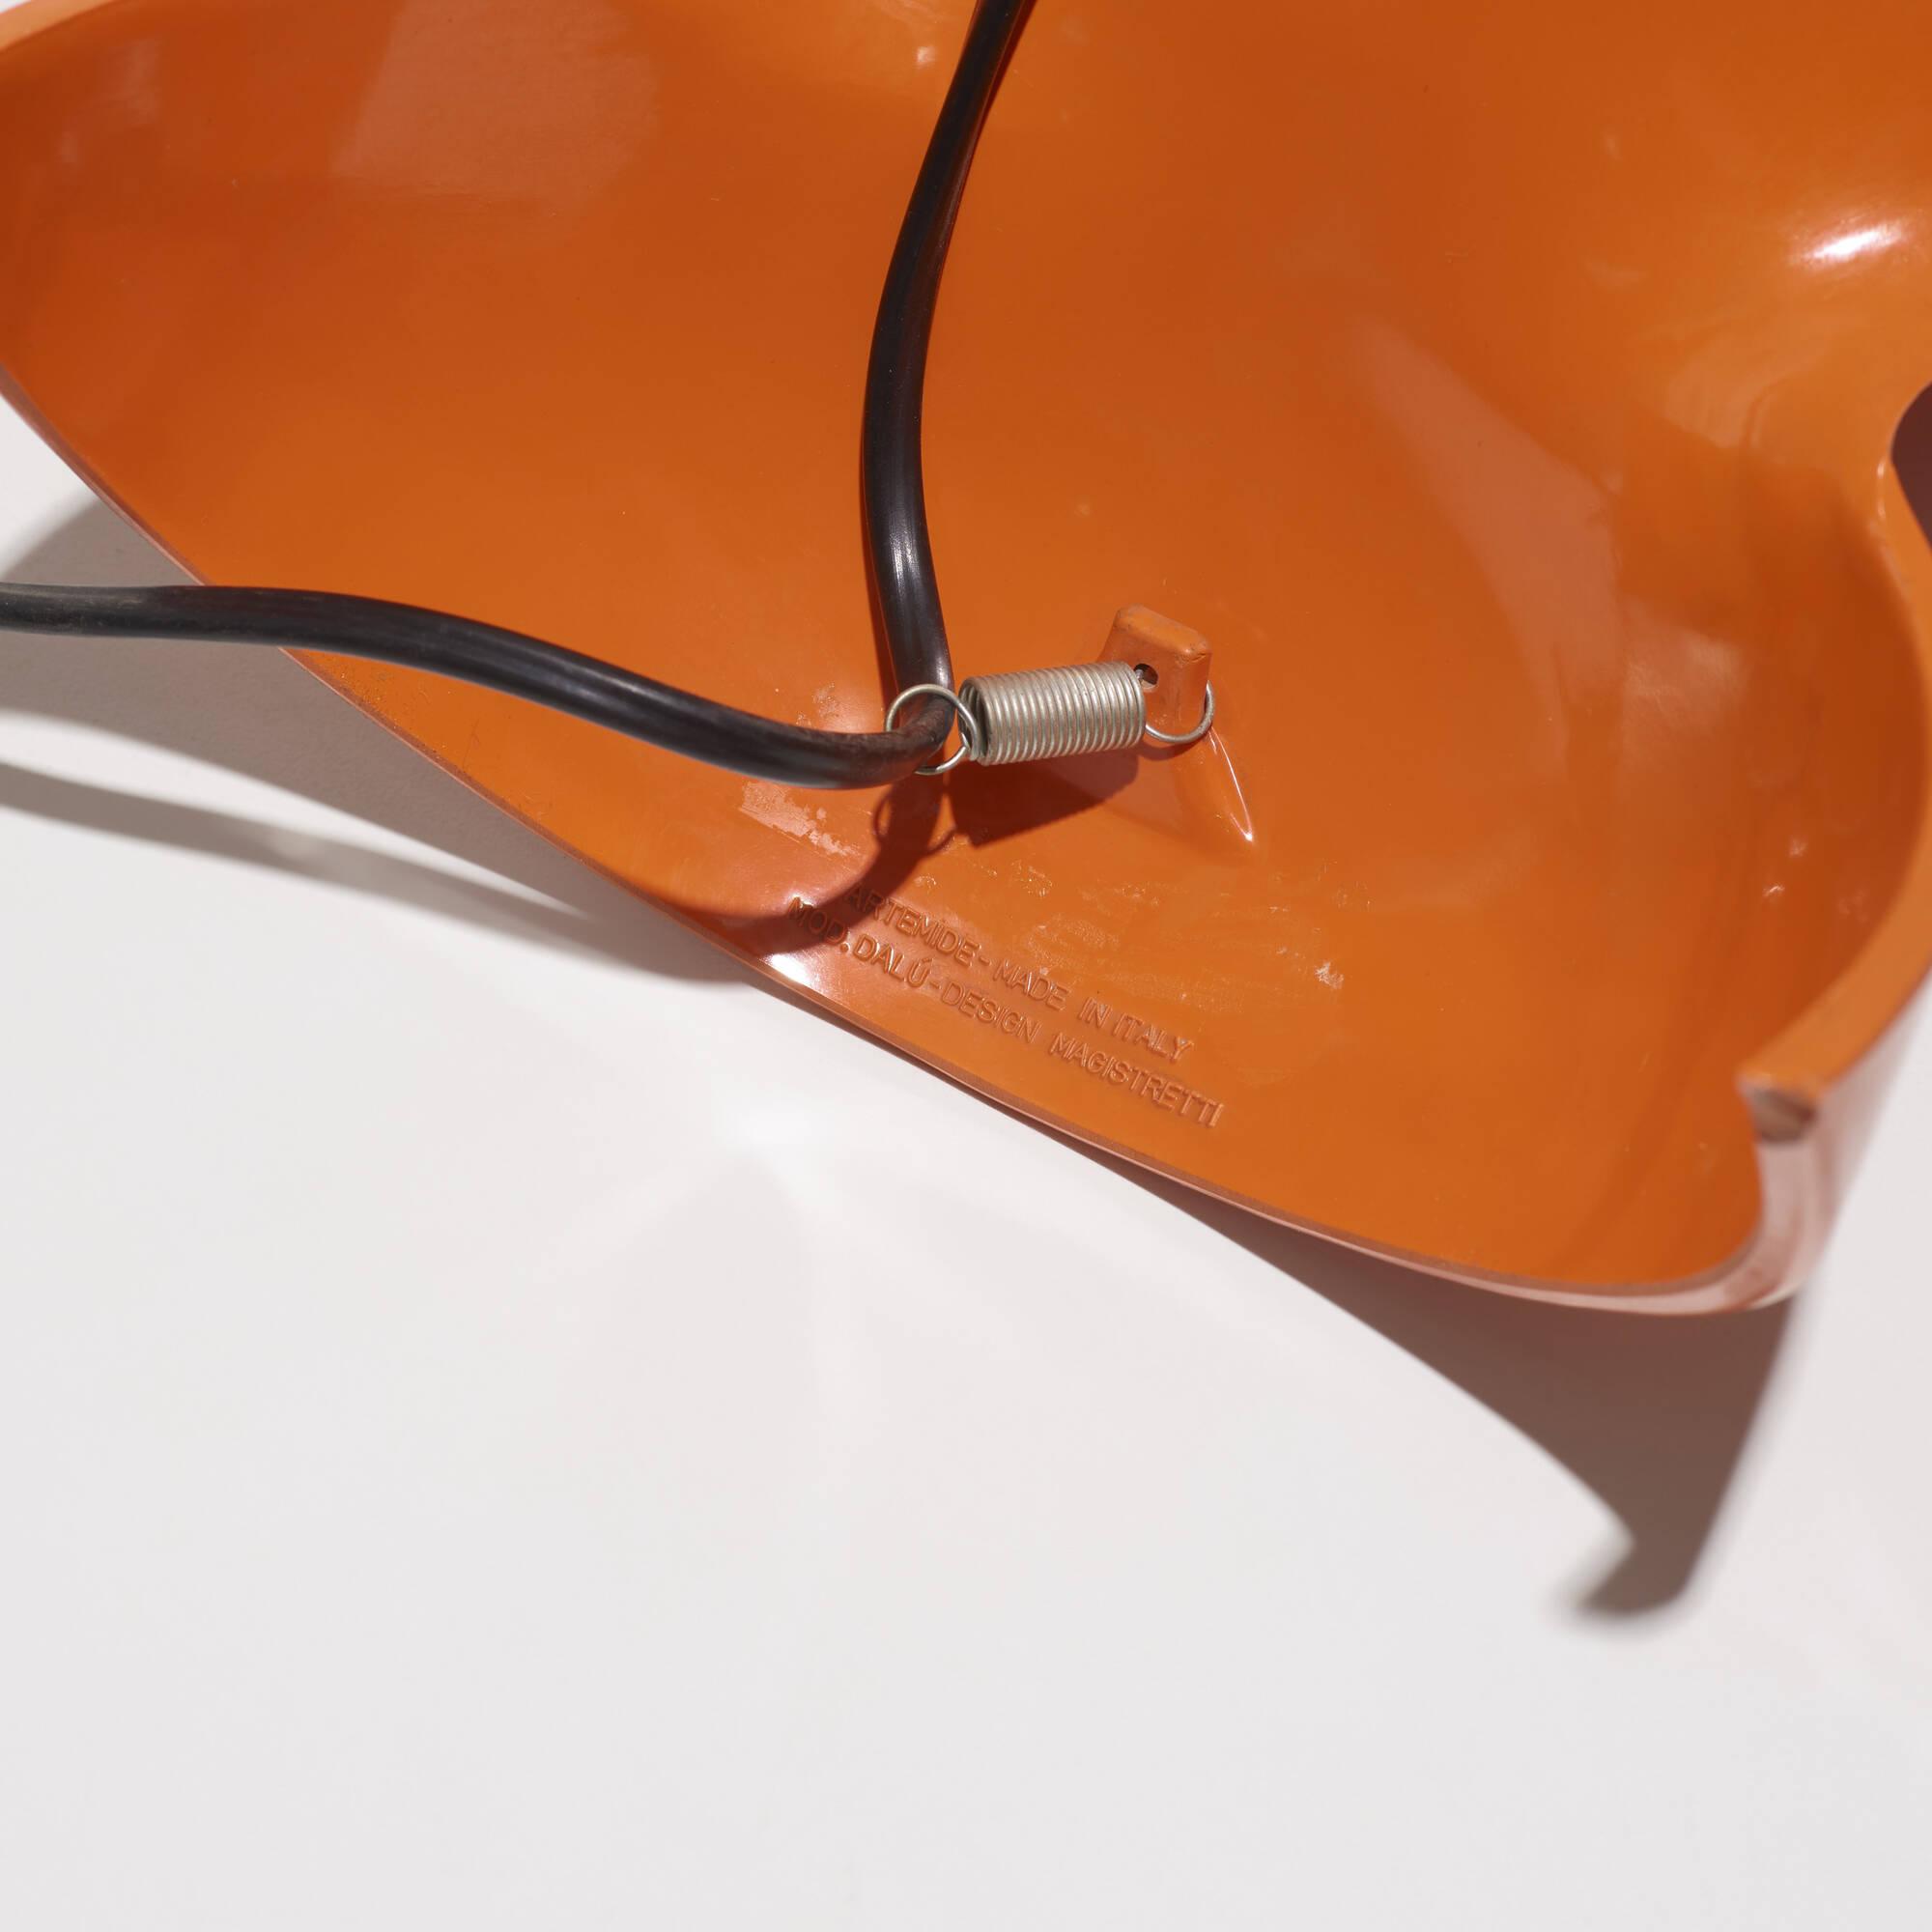 328: Vico Magistretti / Dalu table lamp (2 of 2)